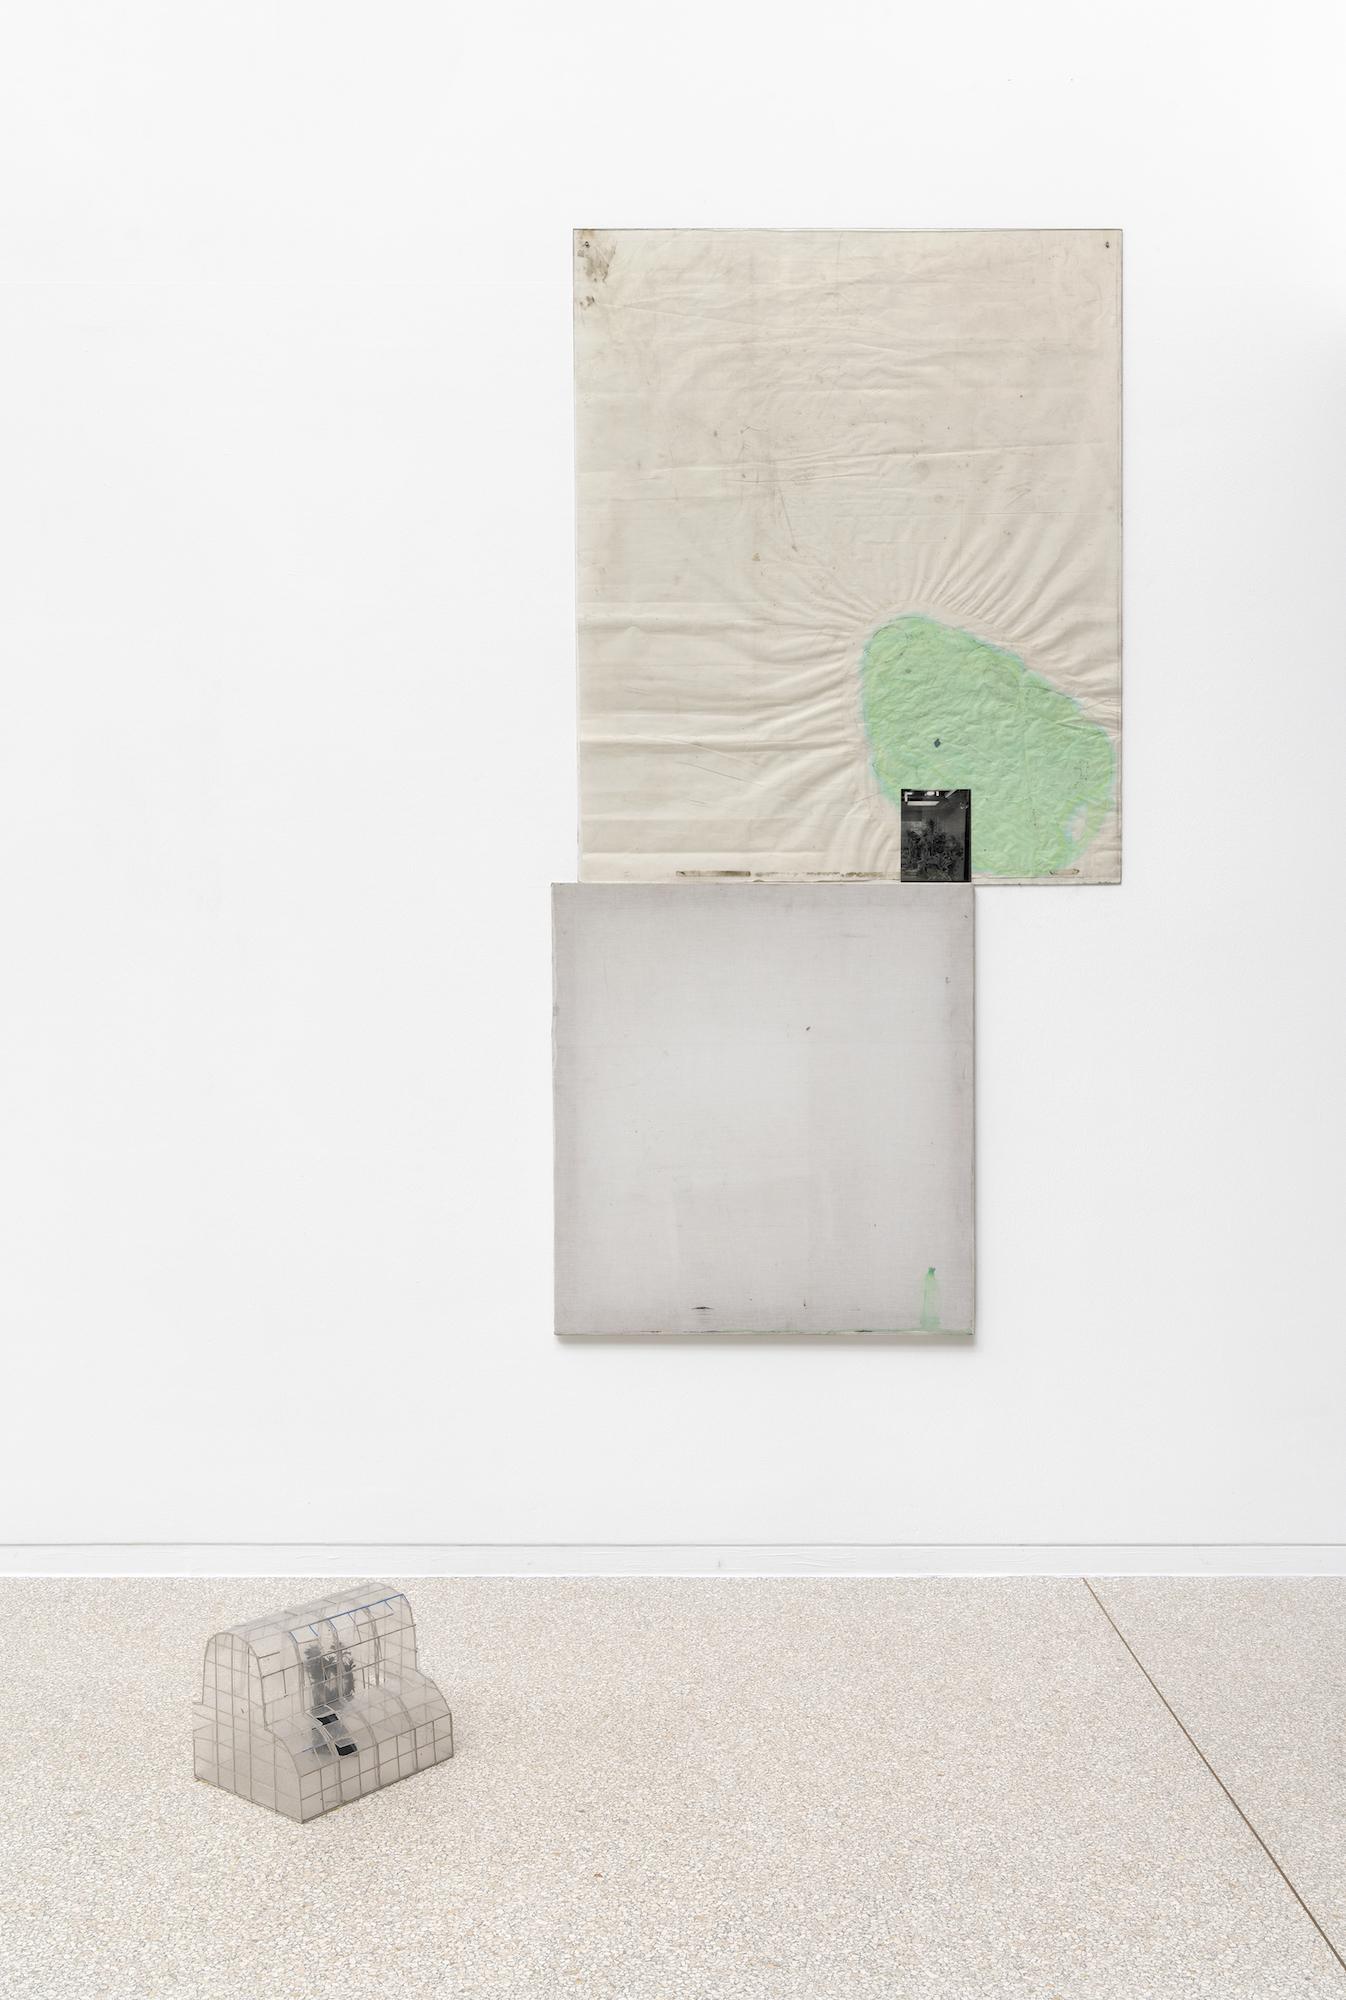 Ian Kiaer, Endnote ping, (J-L Cheret), 2020, endnote (ping), 2020, Installation View, Heidelberger Kunstverein, 2020 © Heidelberger Kunstverein / Wolfgang Günzel